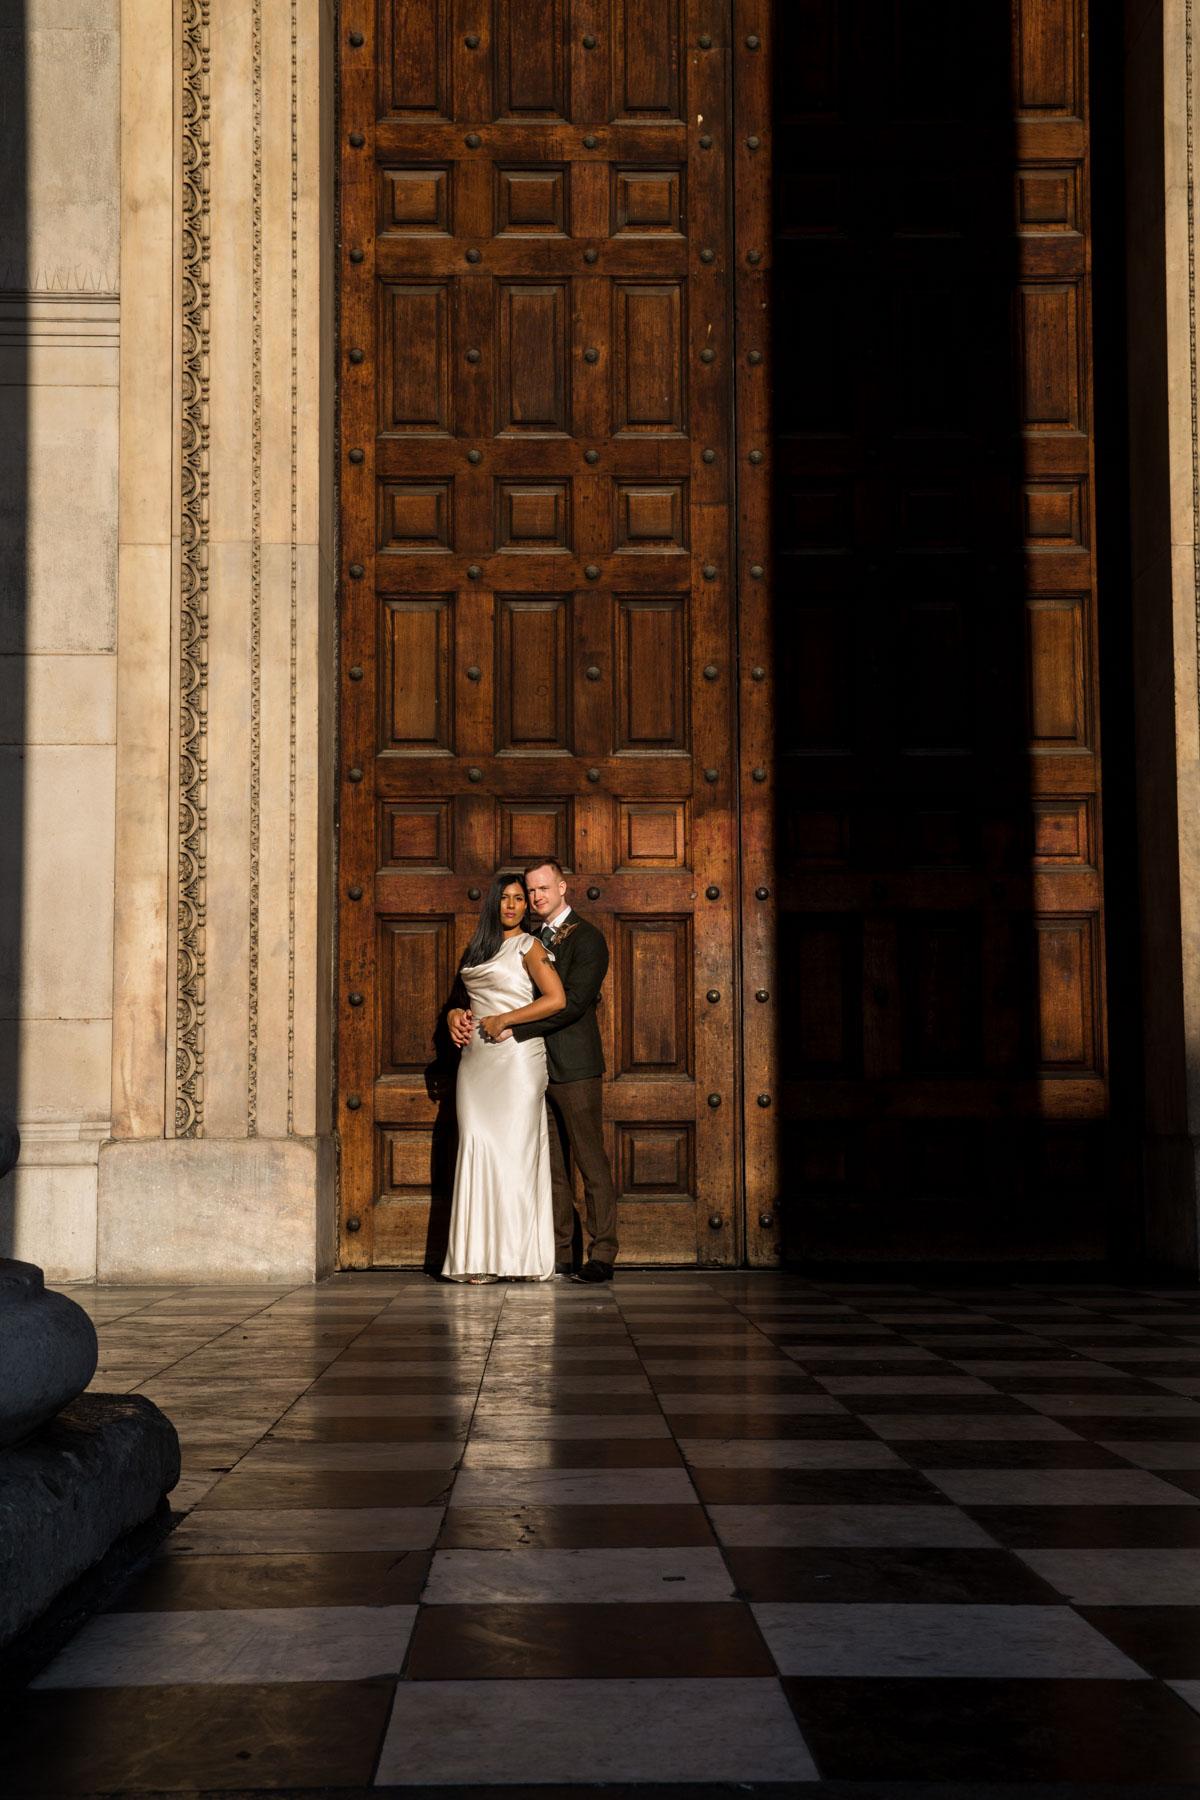 St Pauls Cathedral Wedding Photographer - Richard Murgatroyd Photography